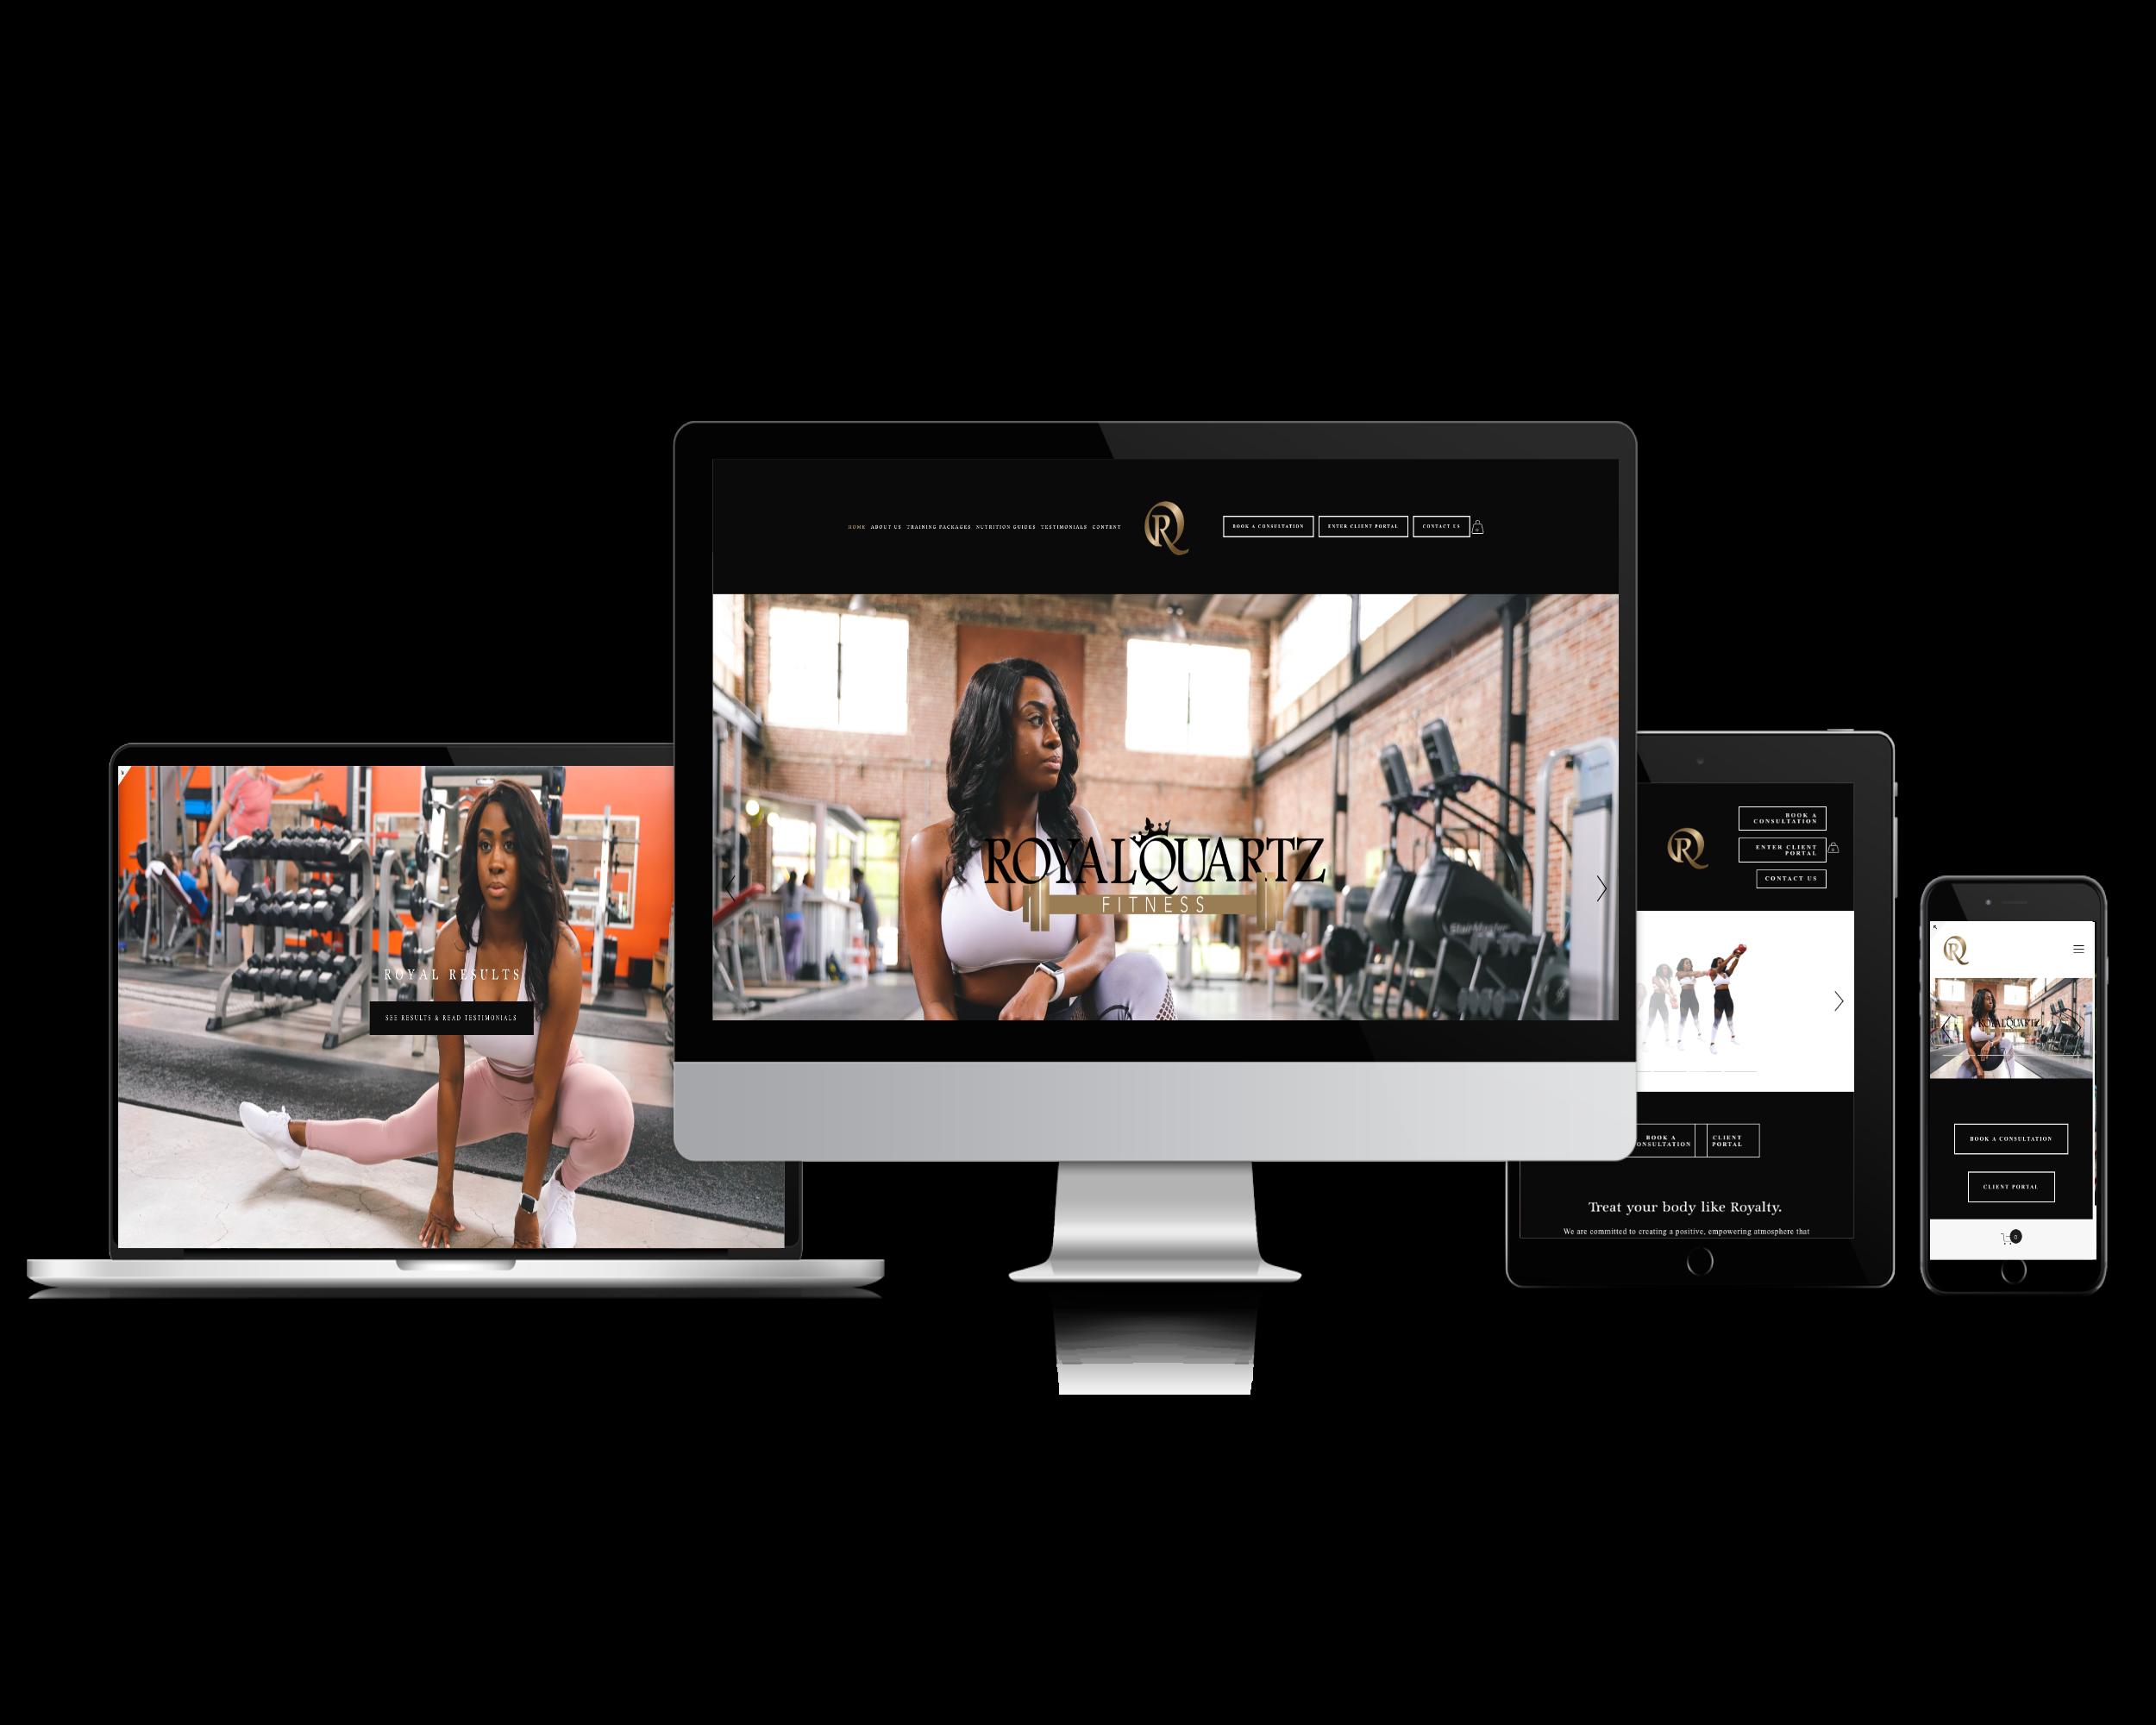 Royal Quartz Fitness (Personal training website)